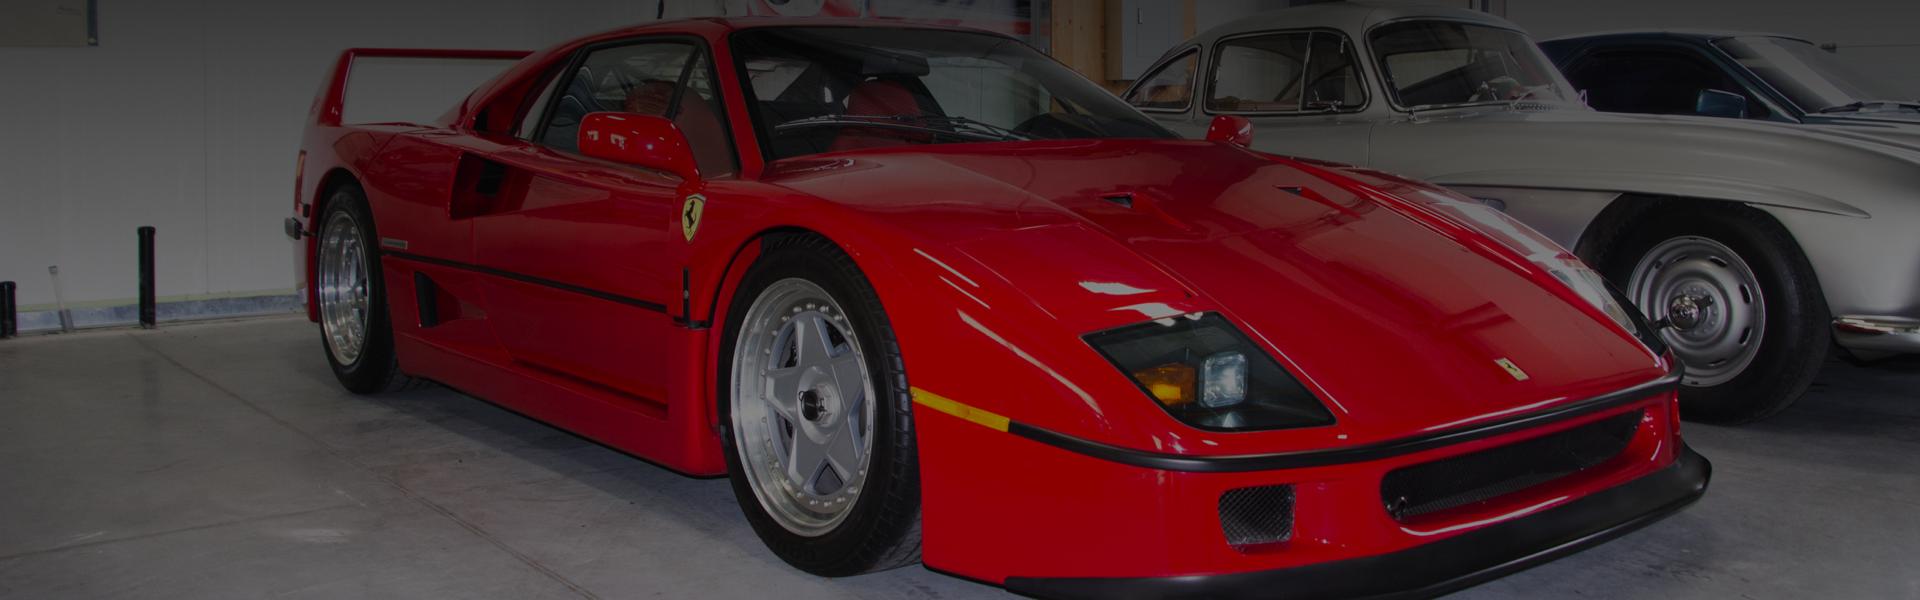 1990 Ferrari F40 at Vintage Motor Sports